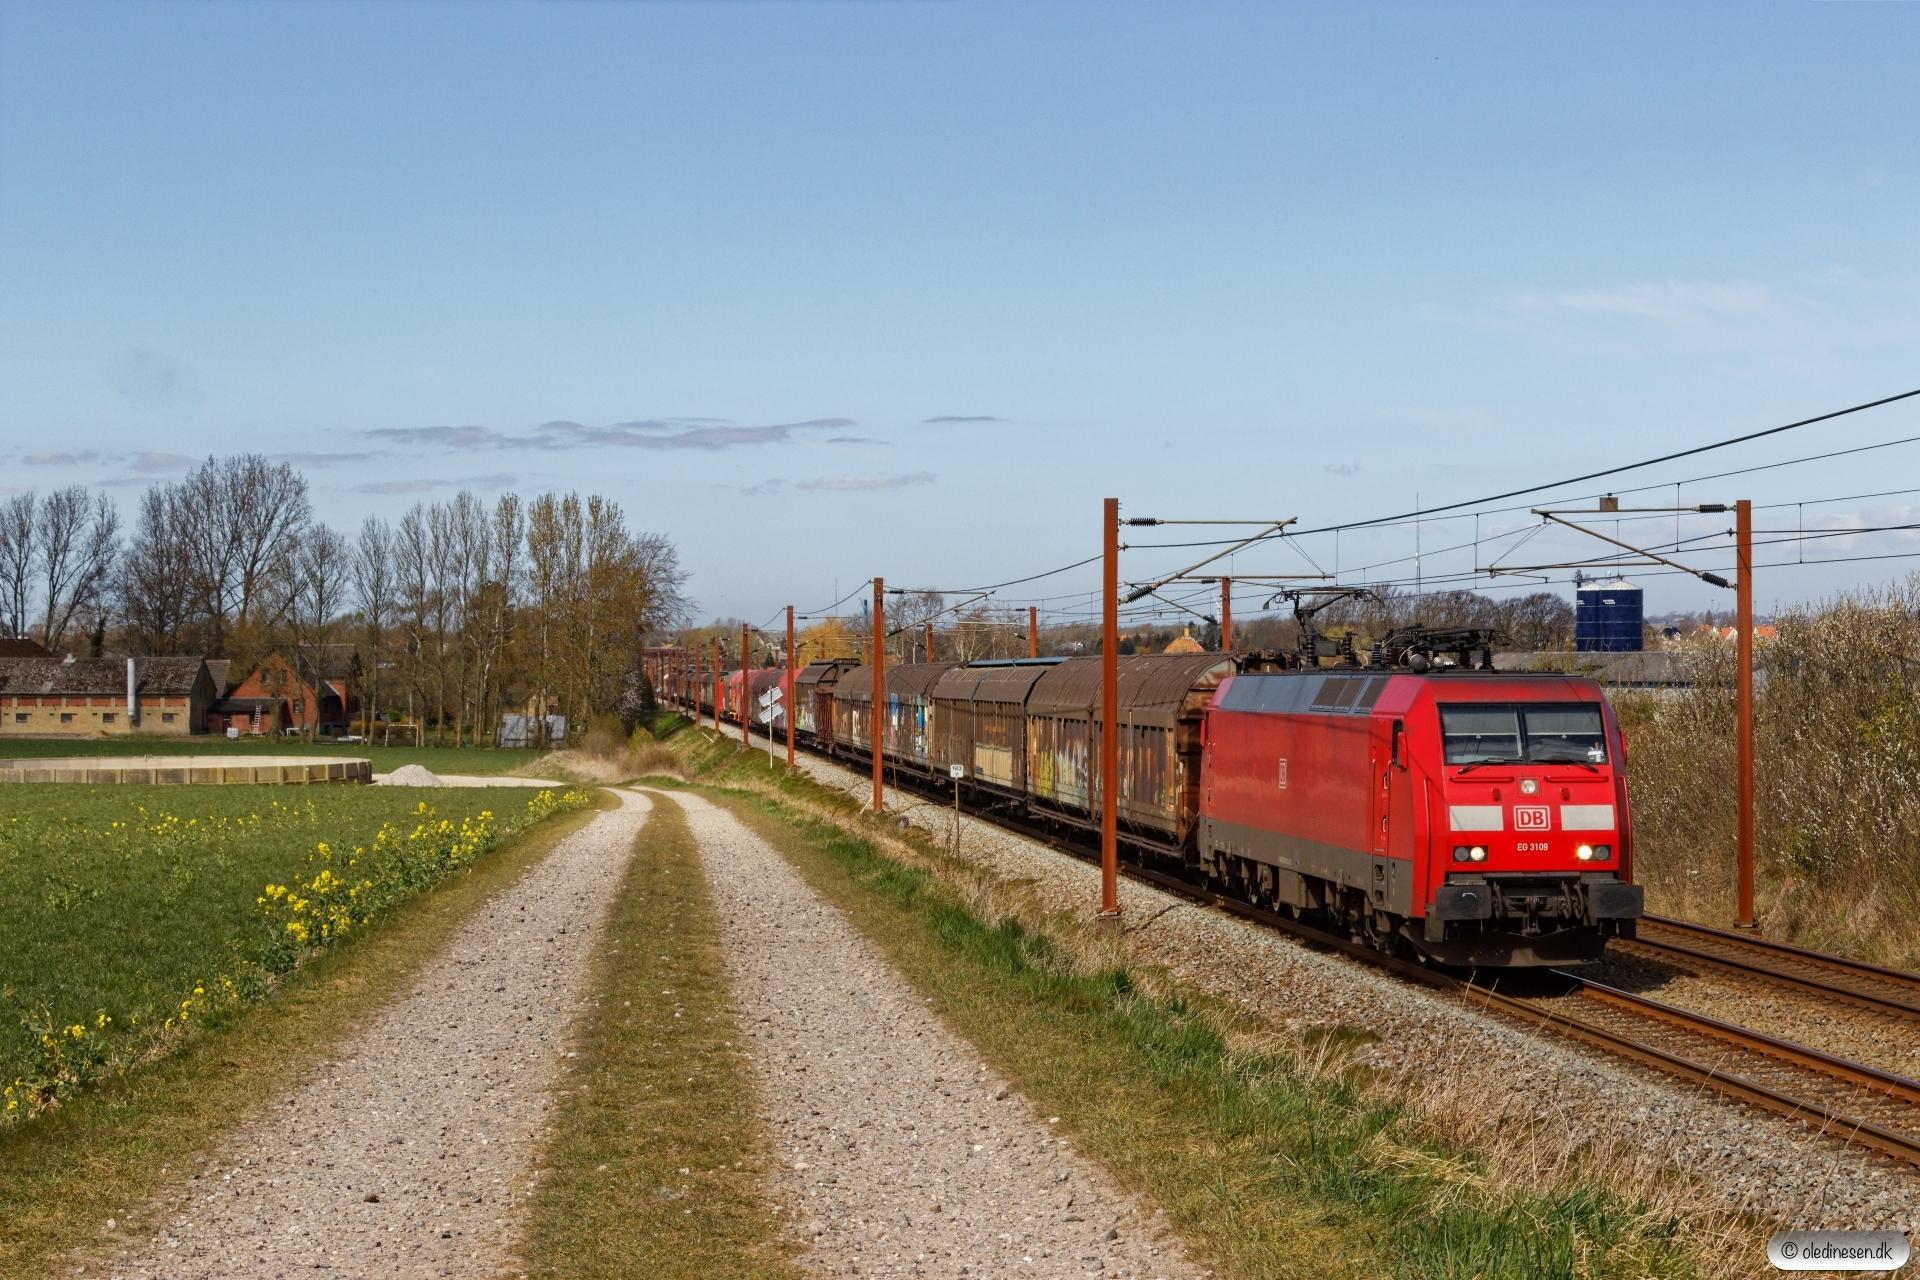 DBCSC EG 3109 med GD 44724 Pa-Mgb. Km 193,0 Kh (Gelsted-Ejby) 17.04.2020.